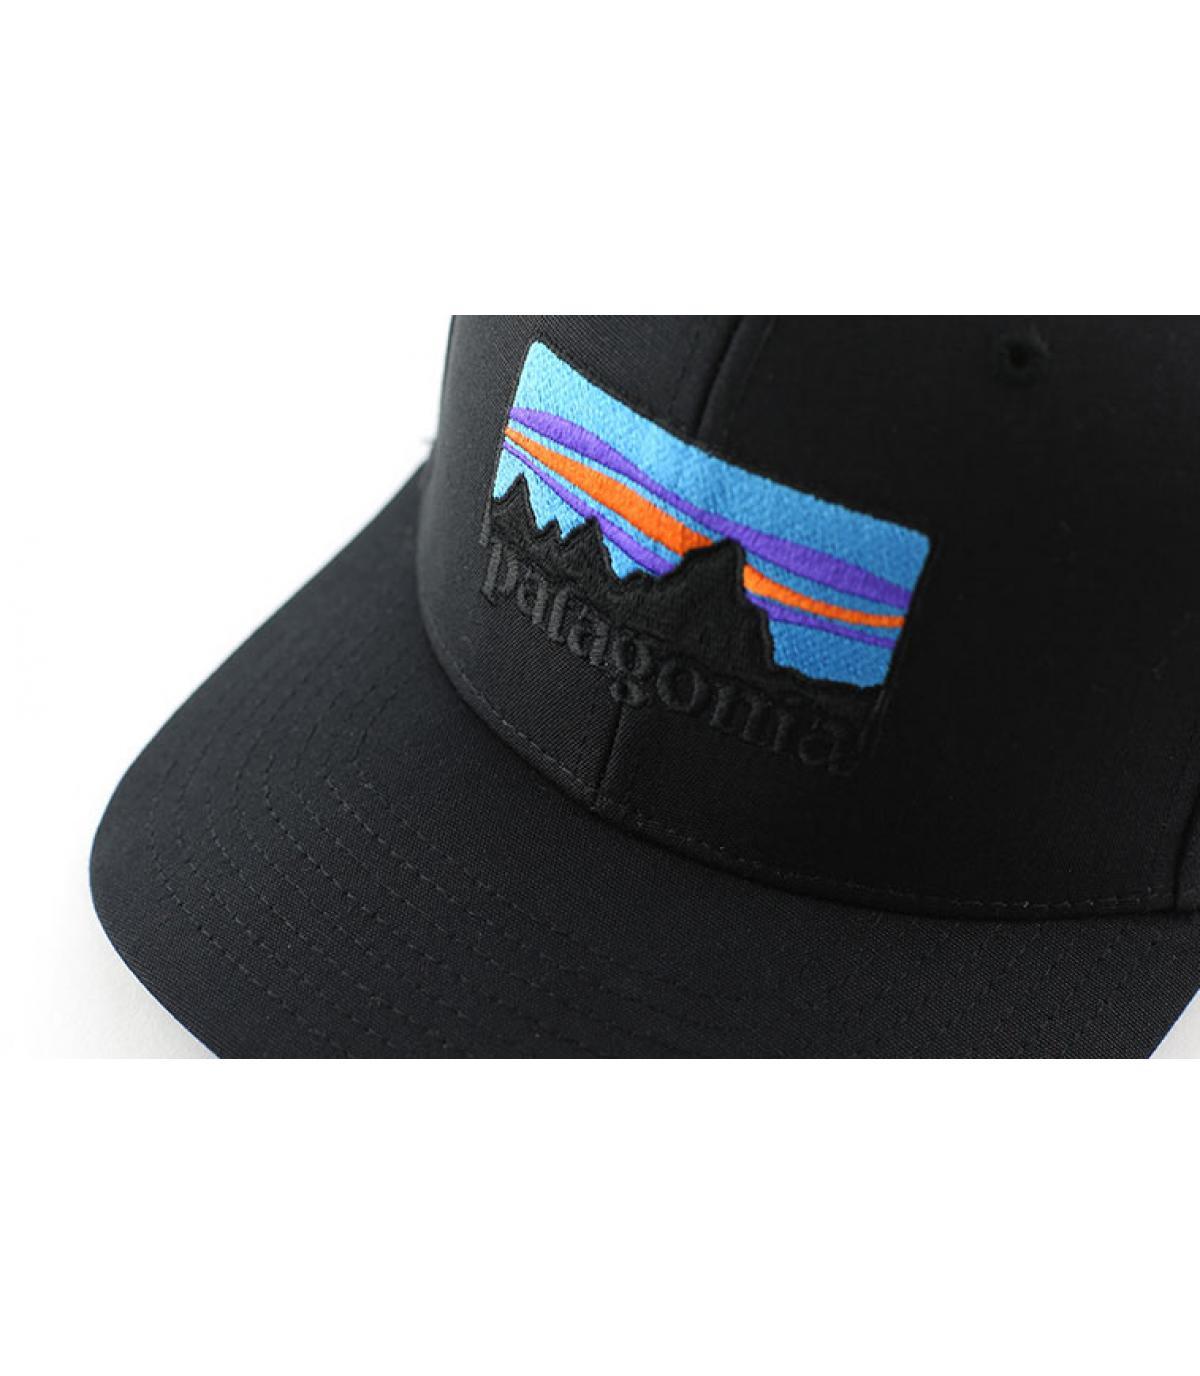 Casquette Patagonia noire